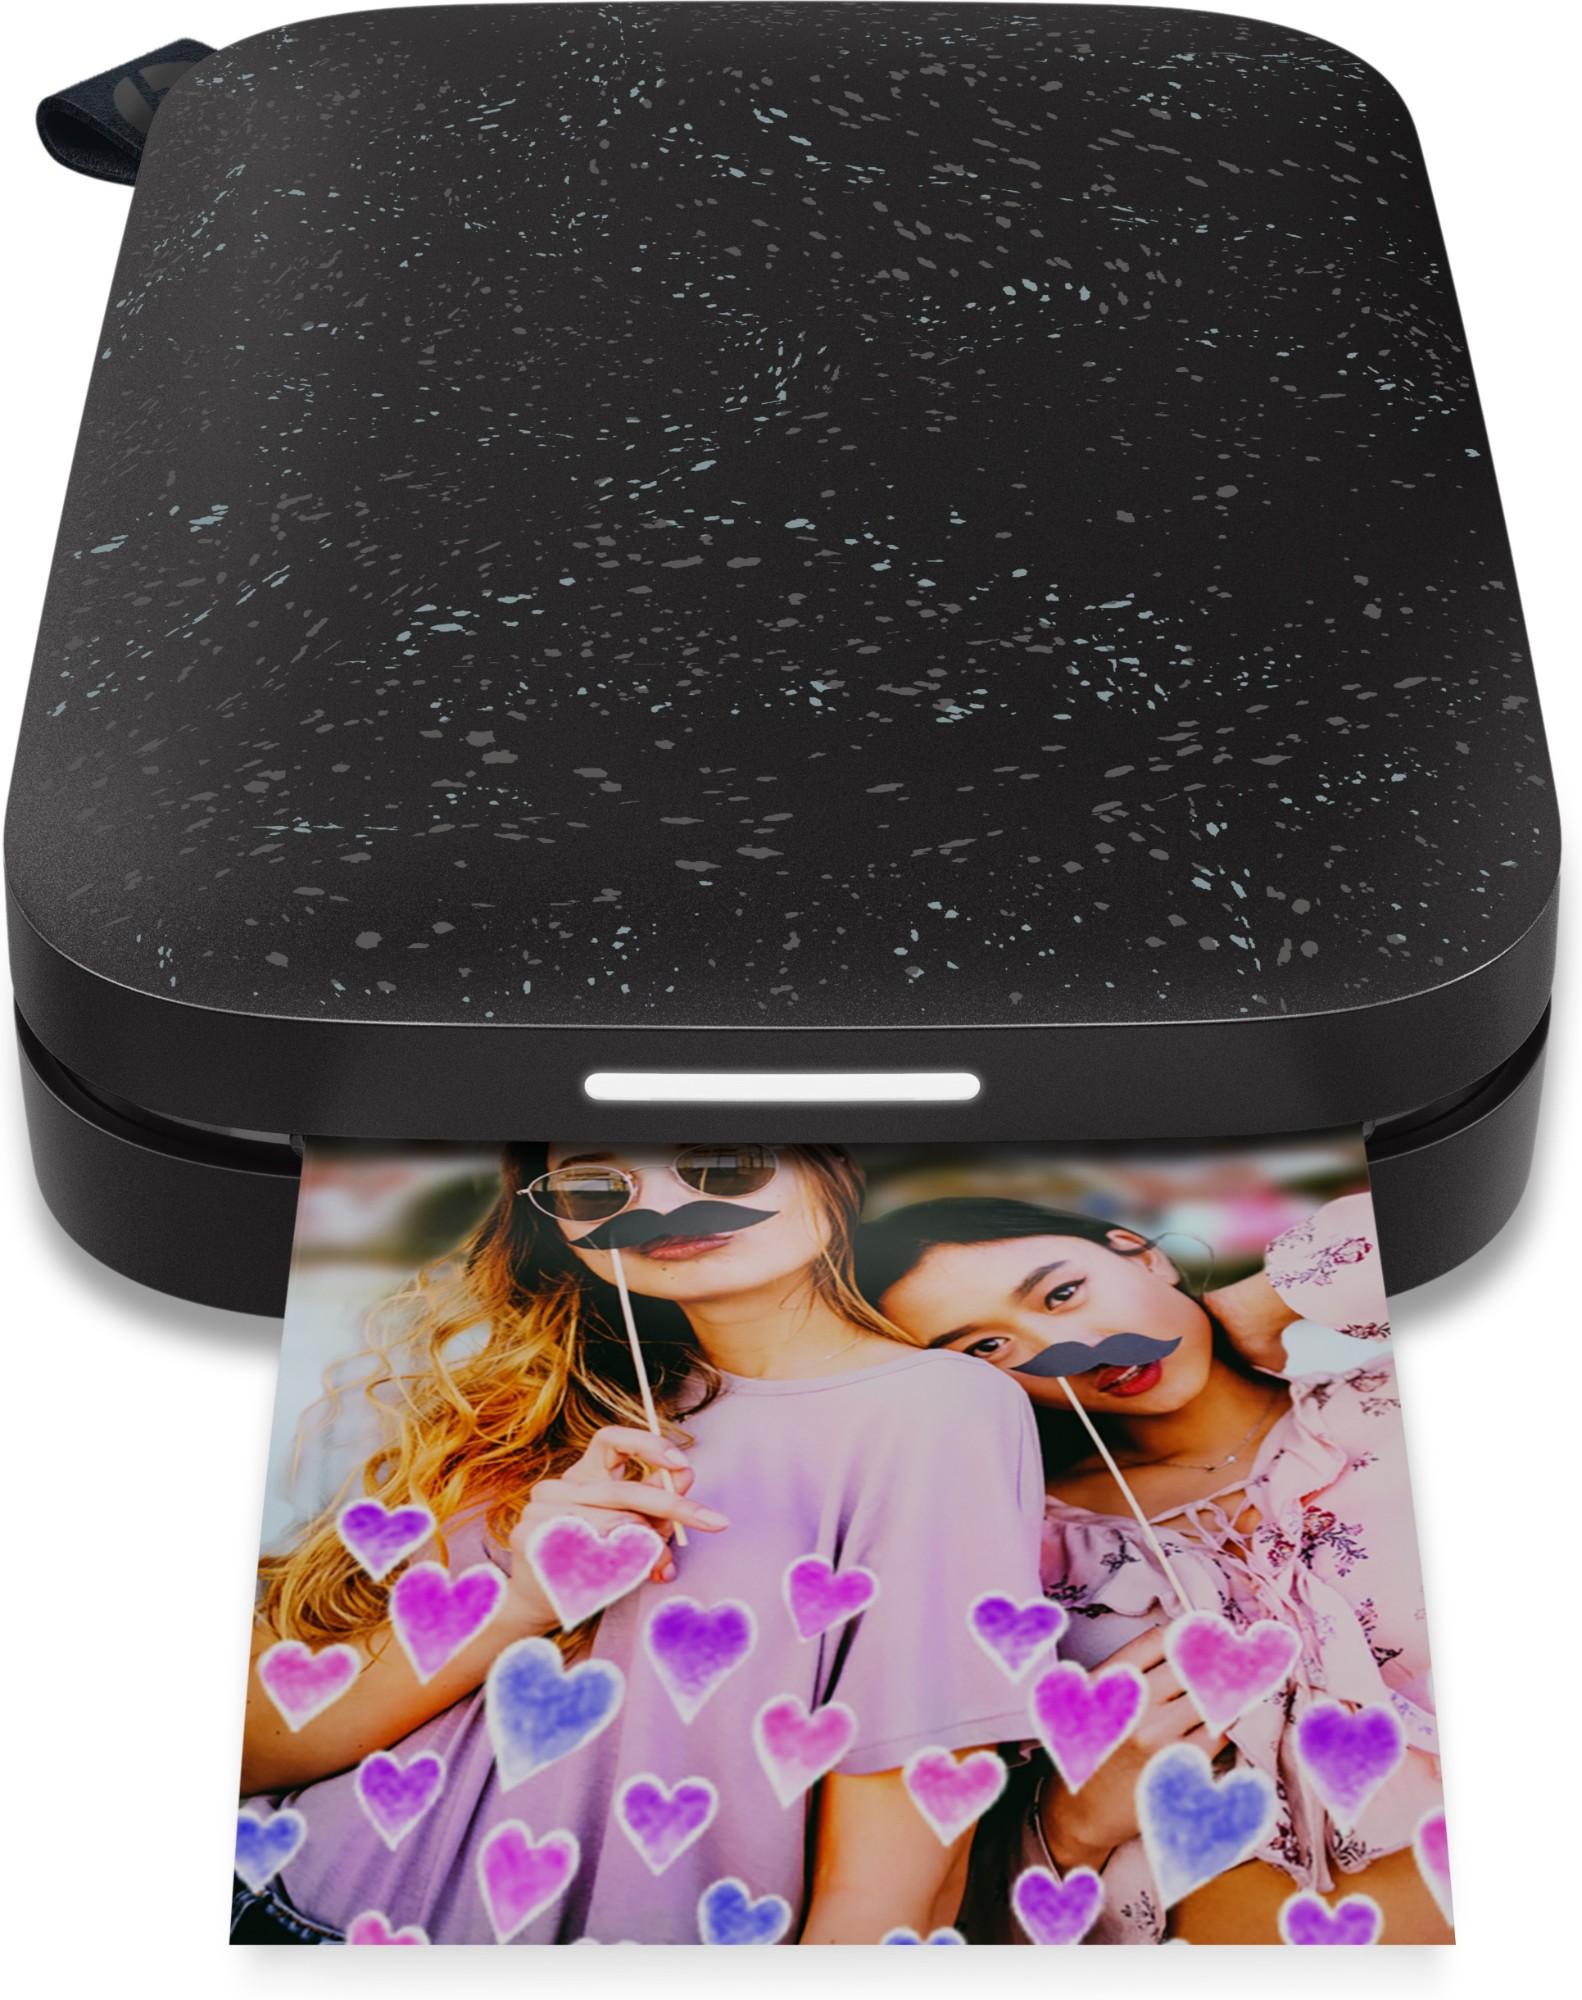 HP Sprocket 200 Printer Bundle Noir inkjet printer